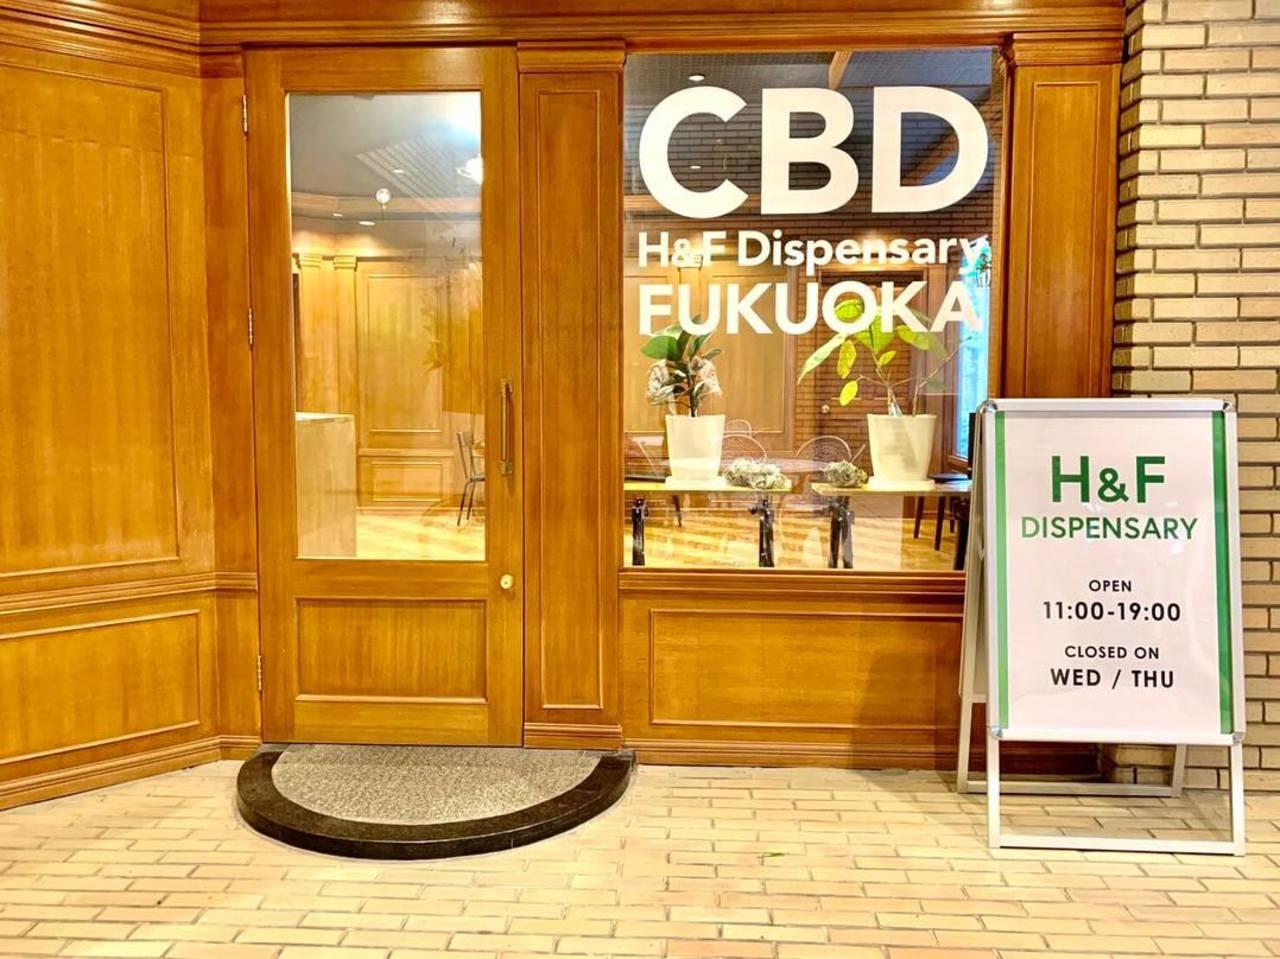 40133H&F DISPENSARY 福岡けやき通り店